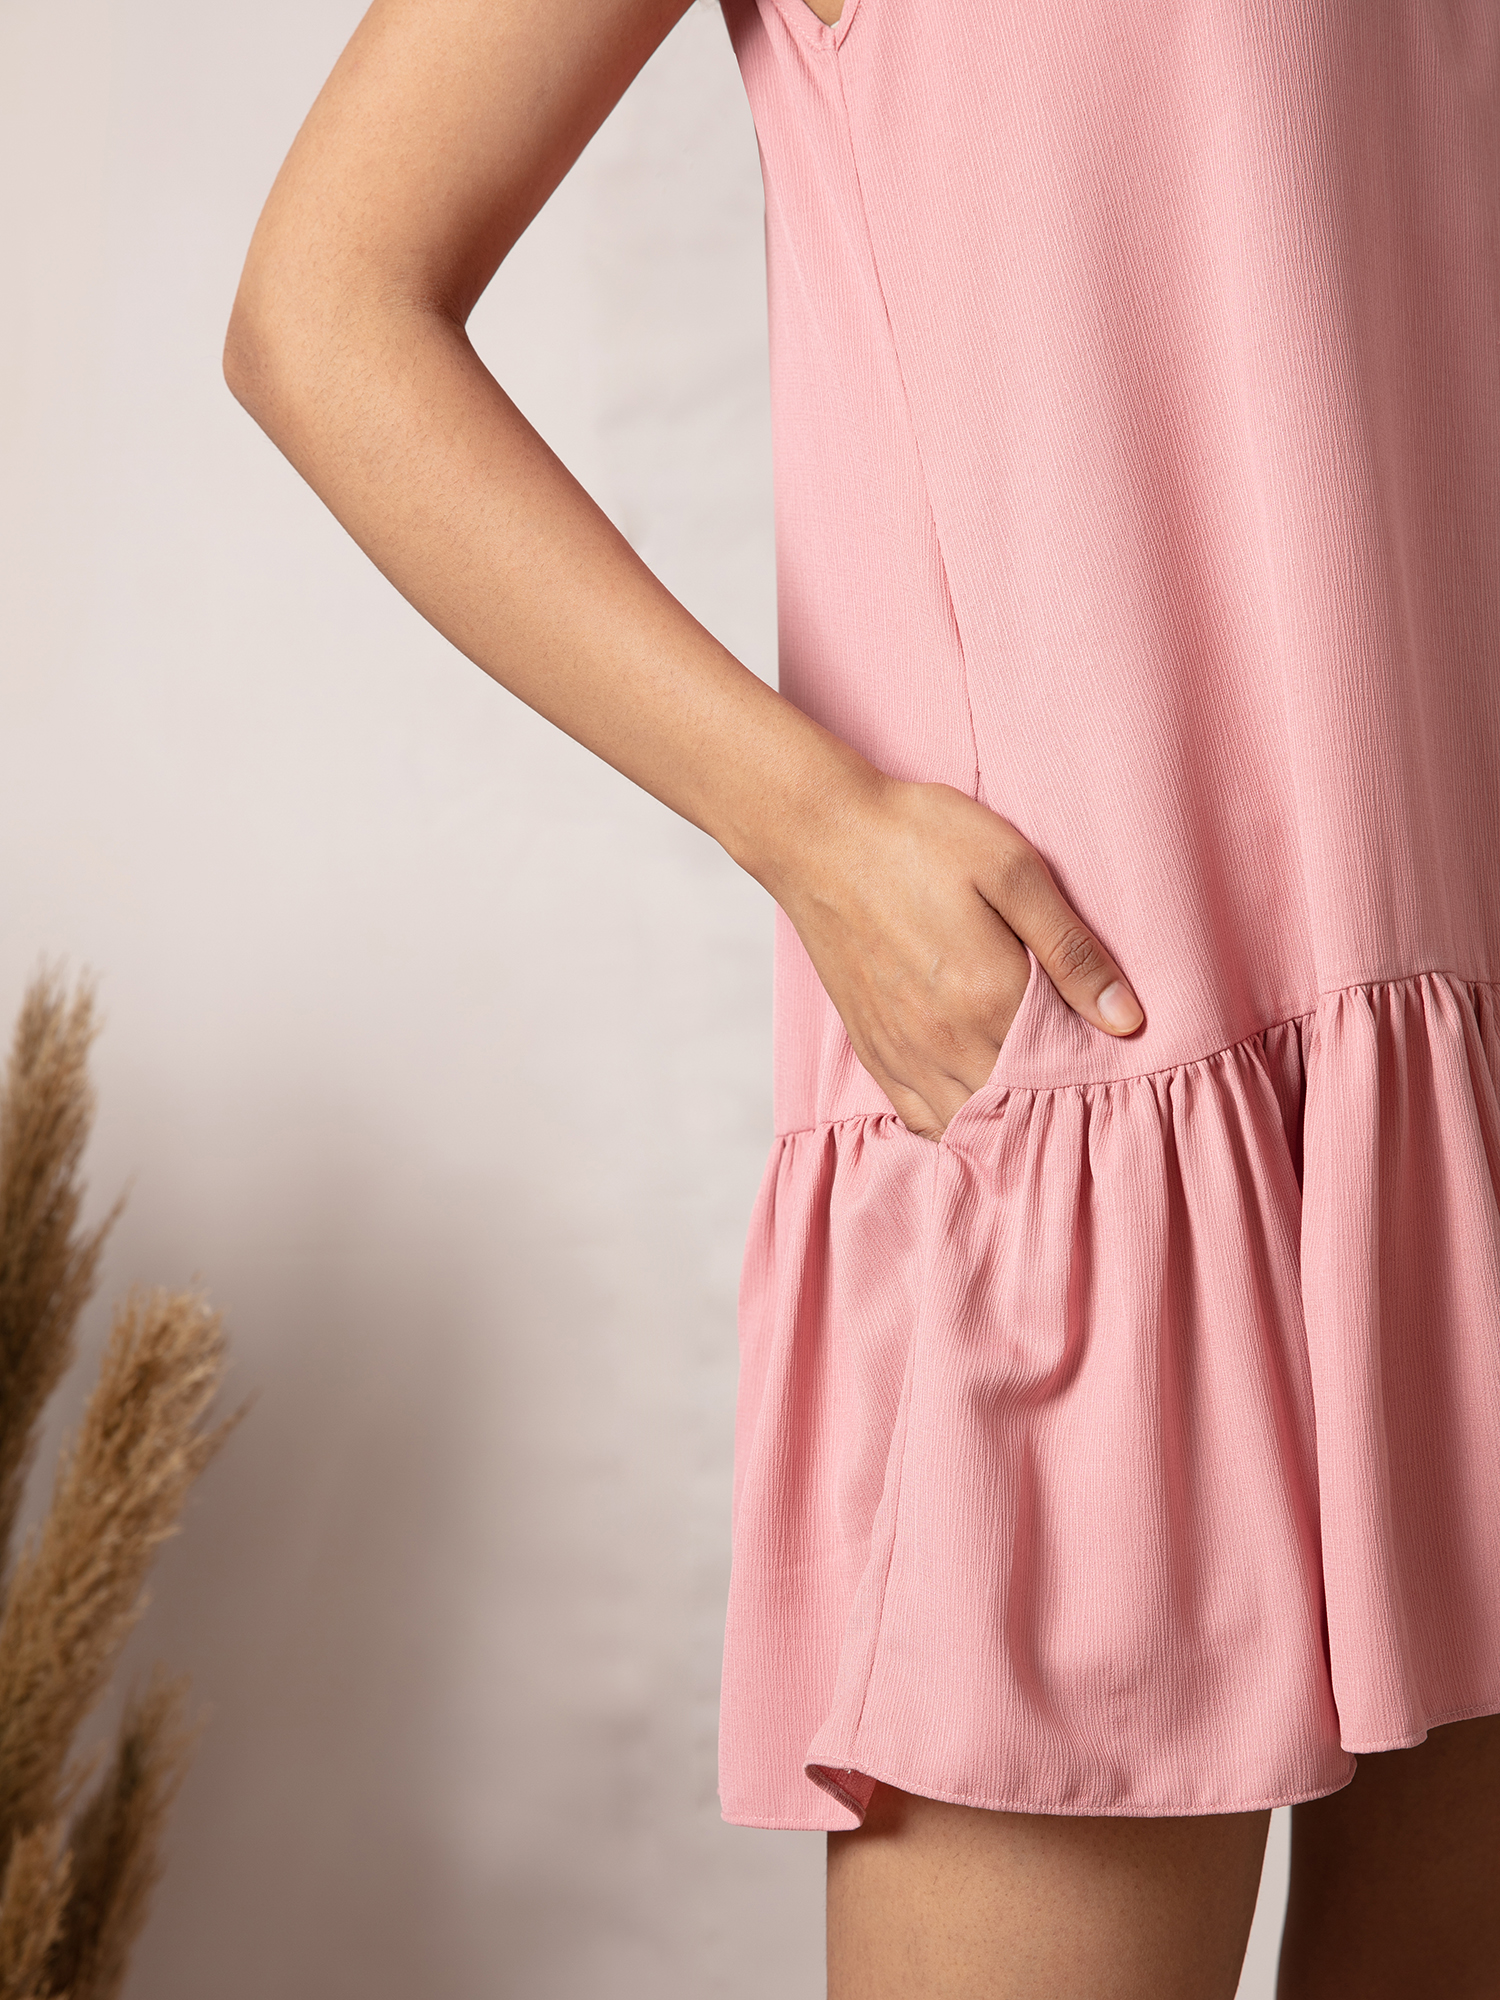 Dresses-Pink The Pretty Little Dress 6